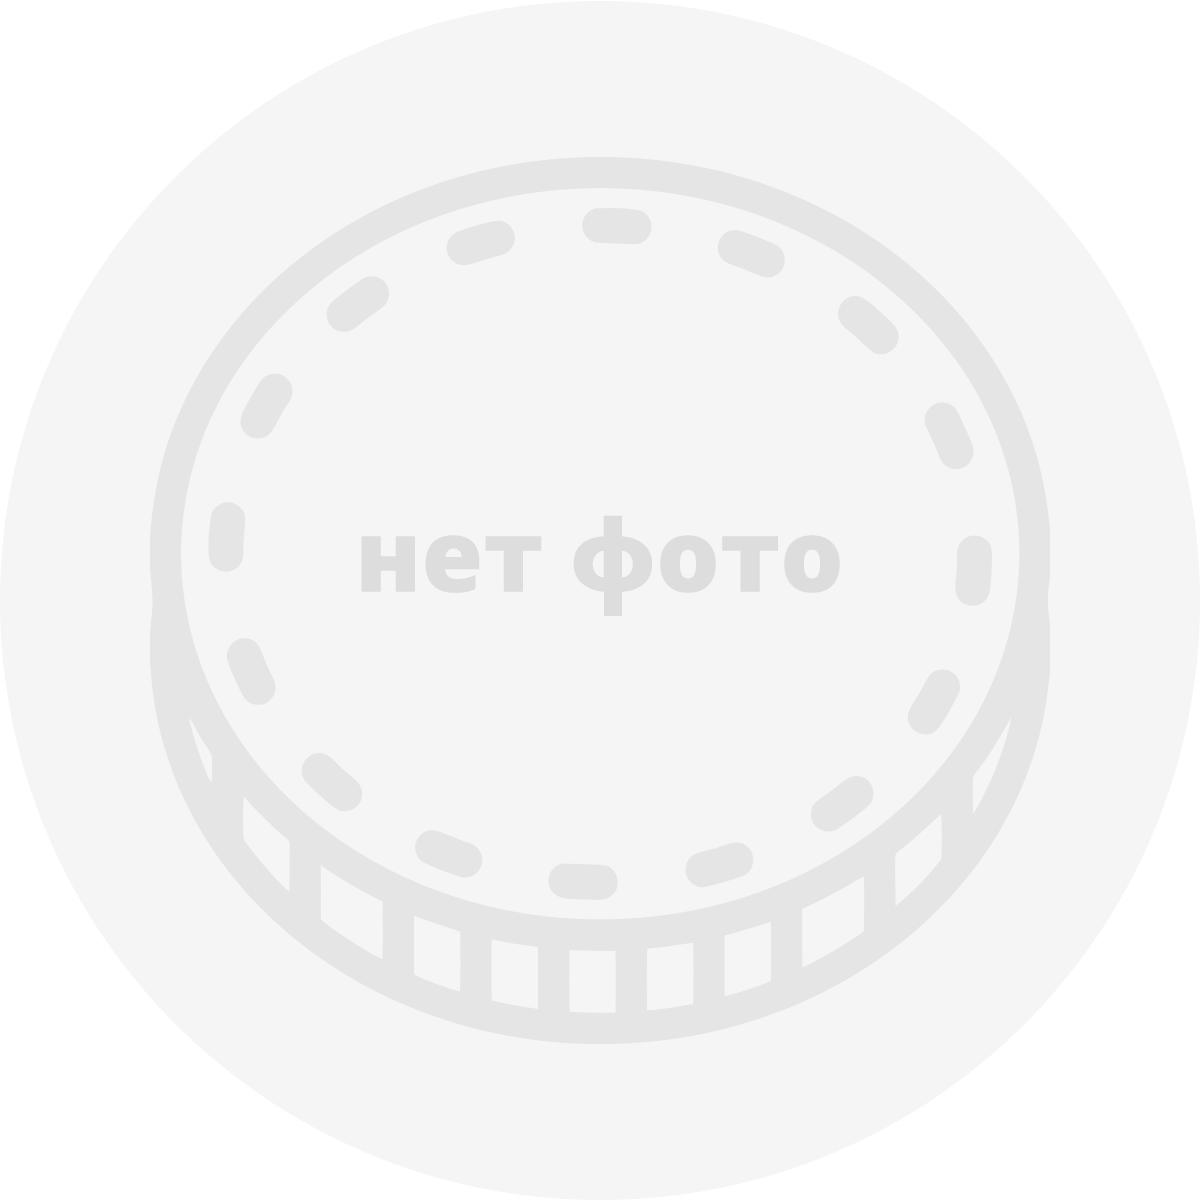 Остров Кокос, Набор монет (2014 г.)